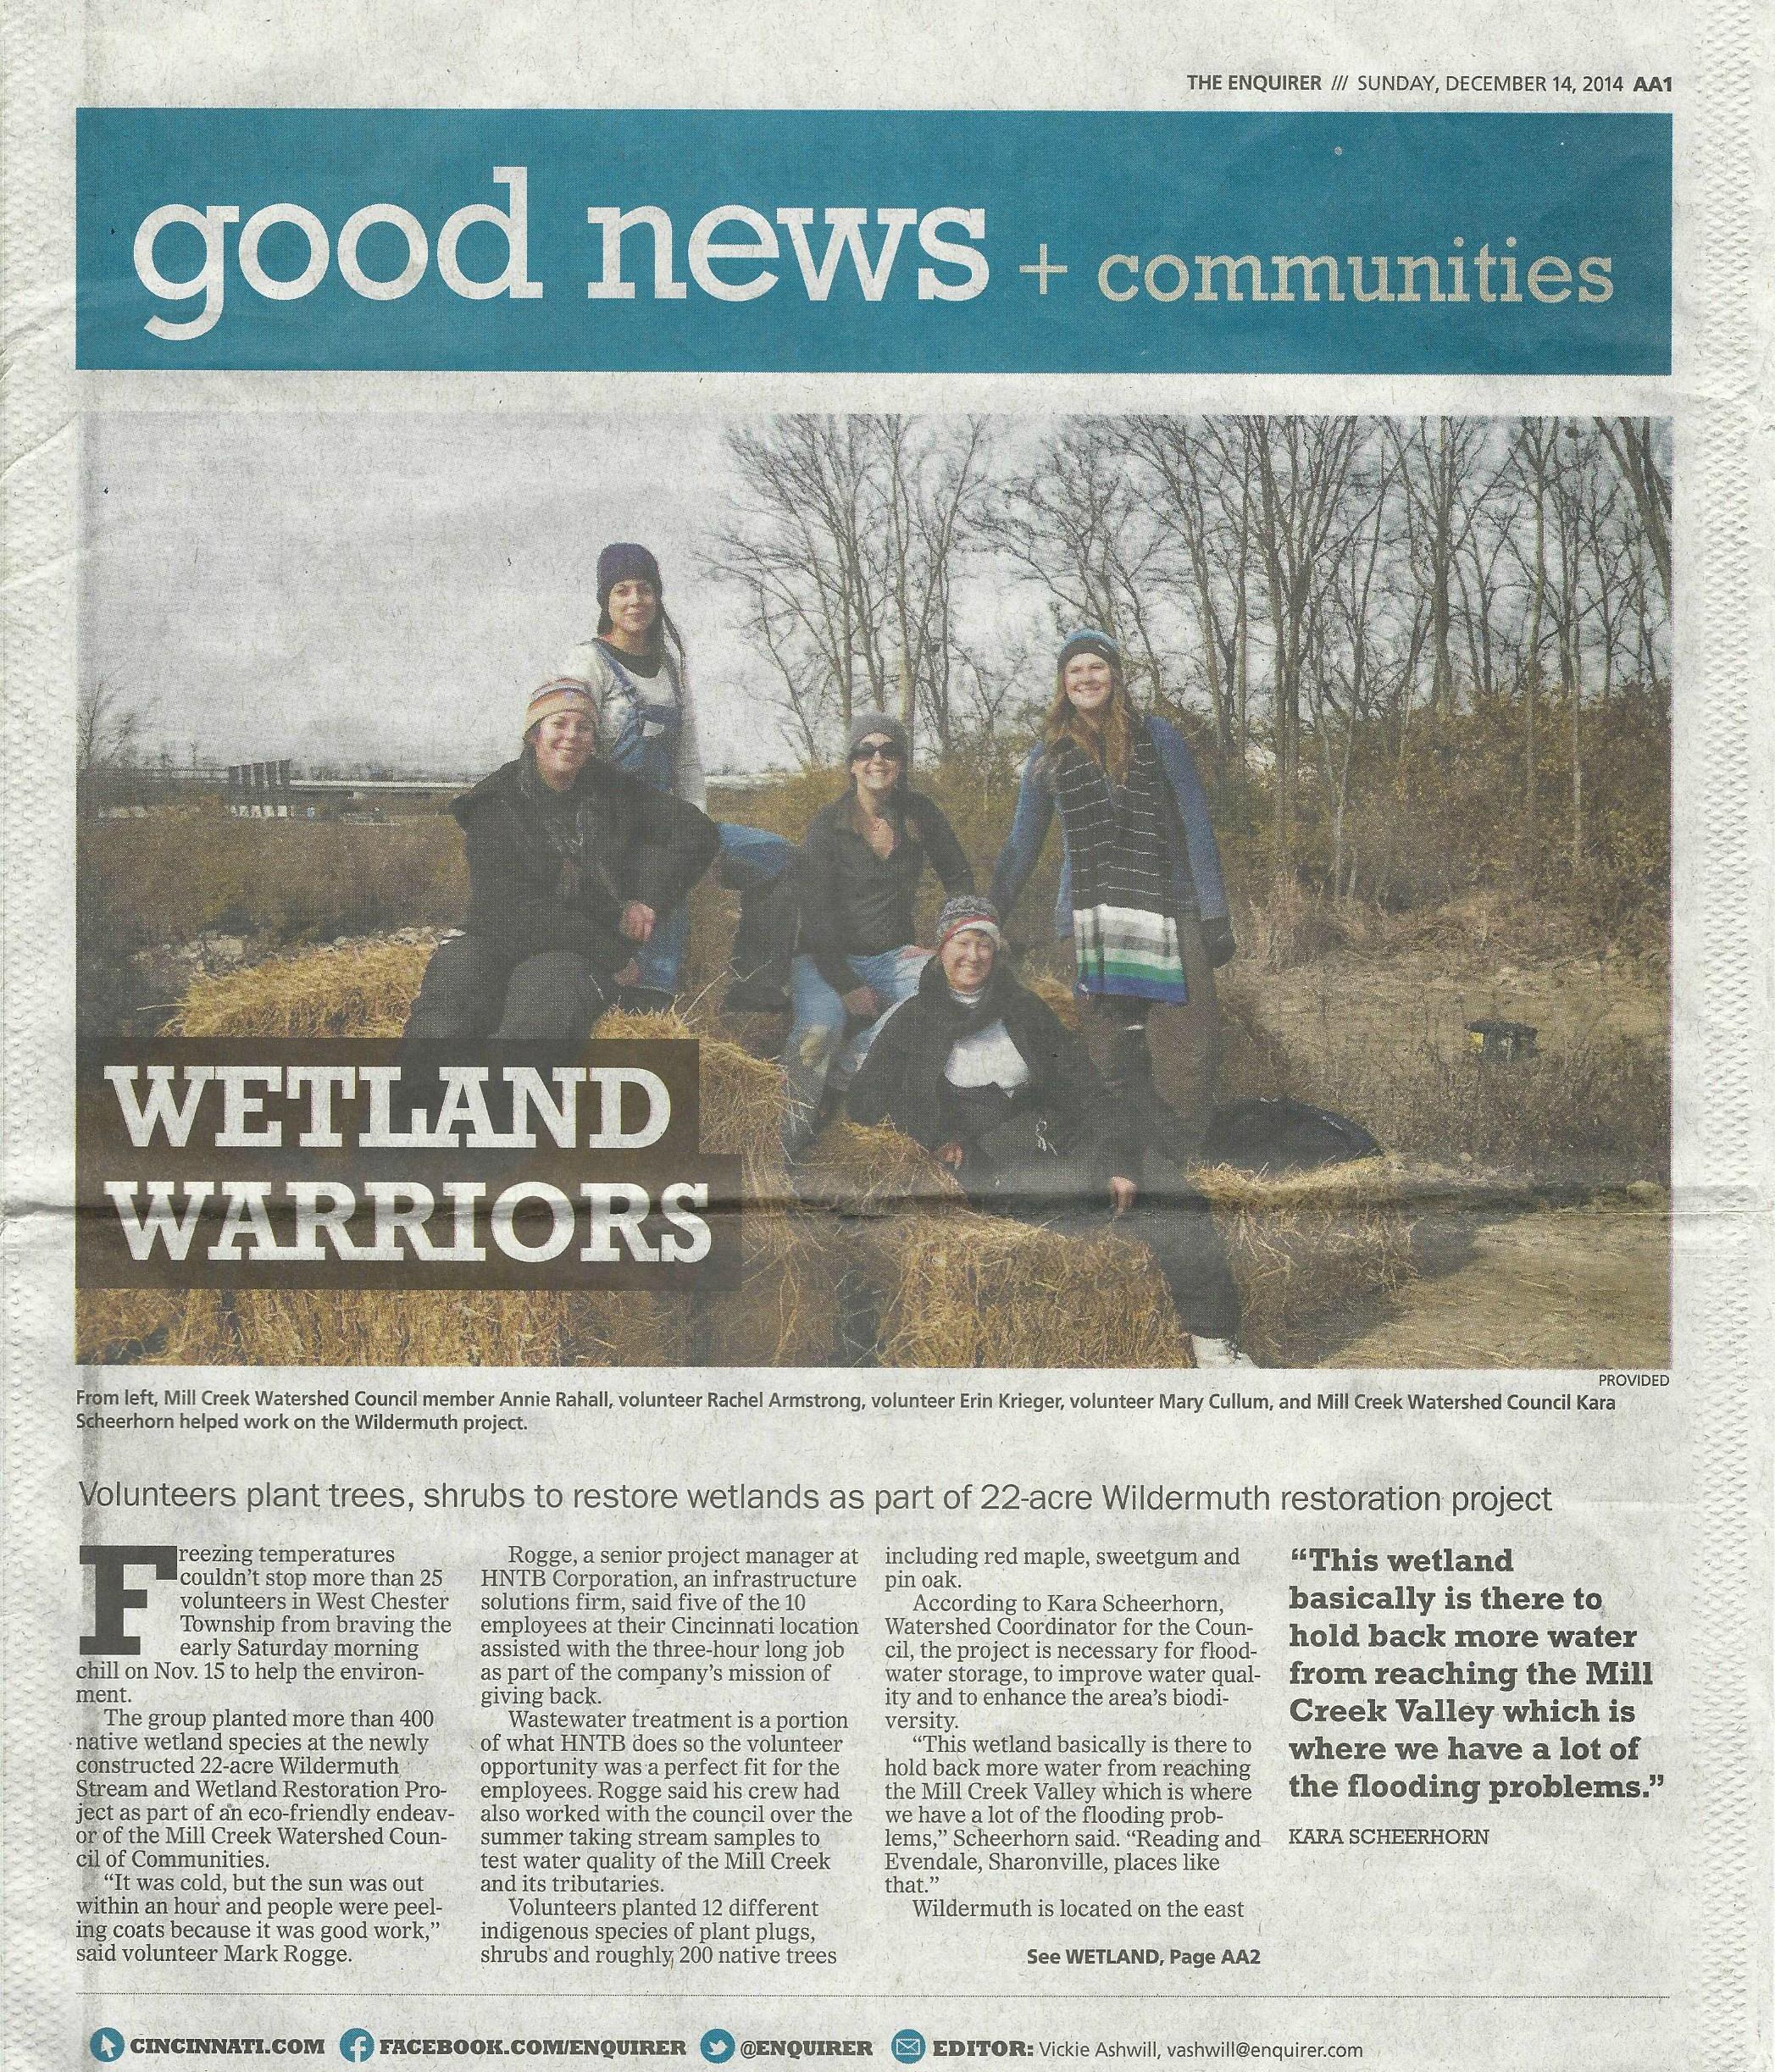 Cincinnati Enquirer_Wetland Warriors_12.14.14__crop1.jpg